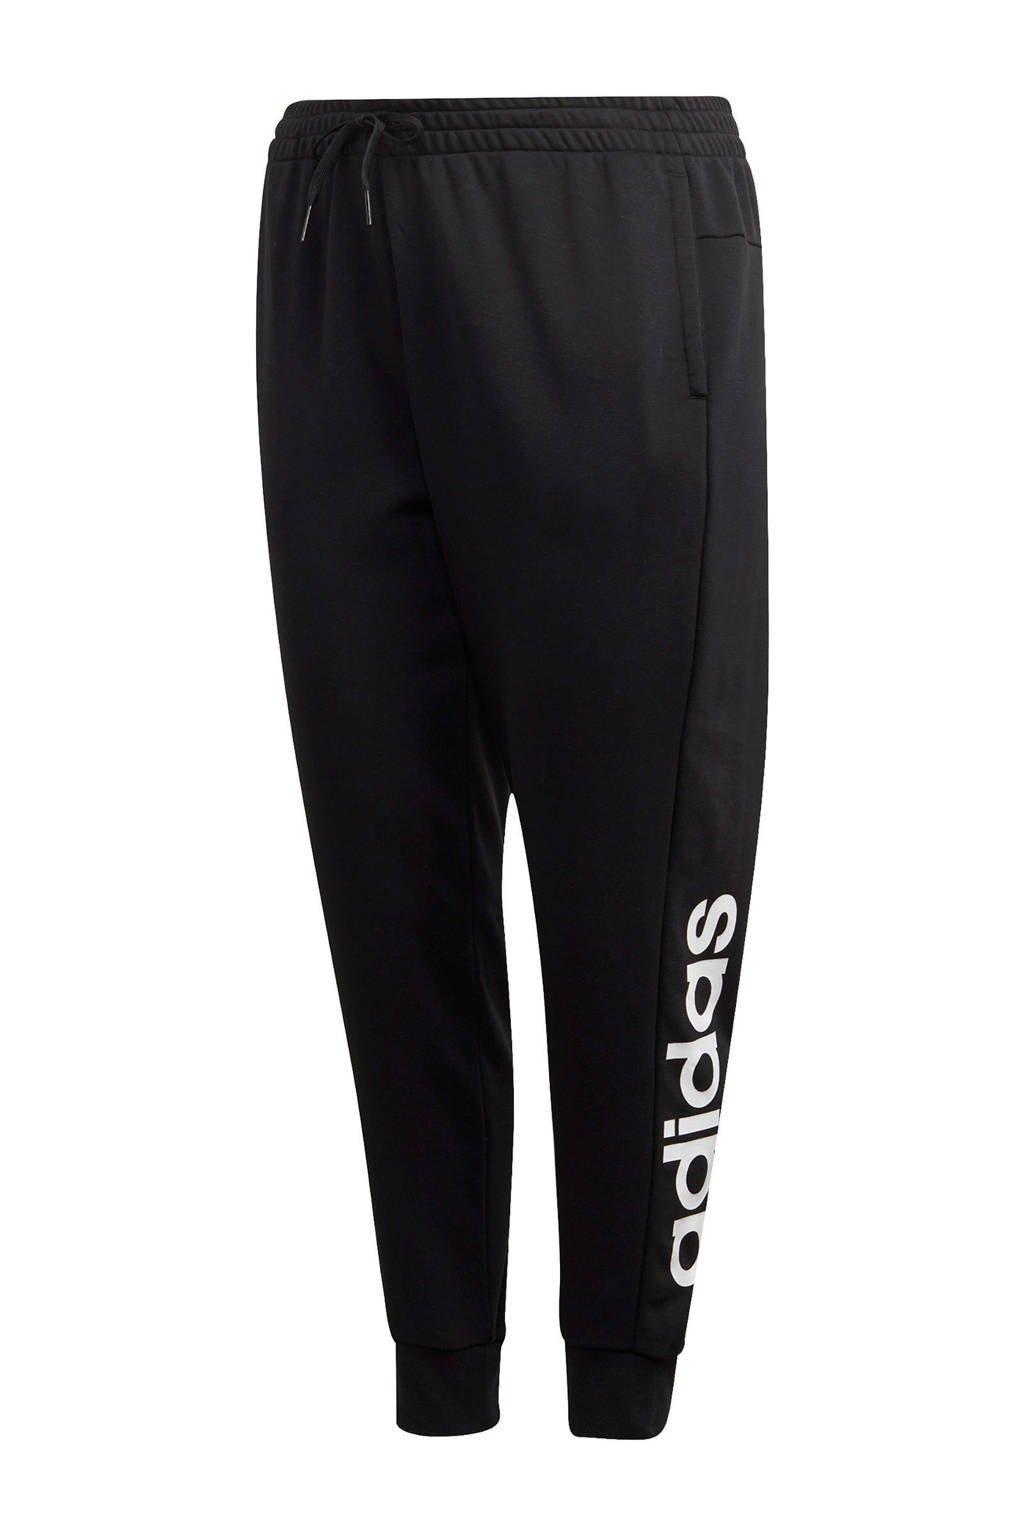 adidas Performance Plus Size joggingbroek zwart/wit, Zwart/wit